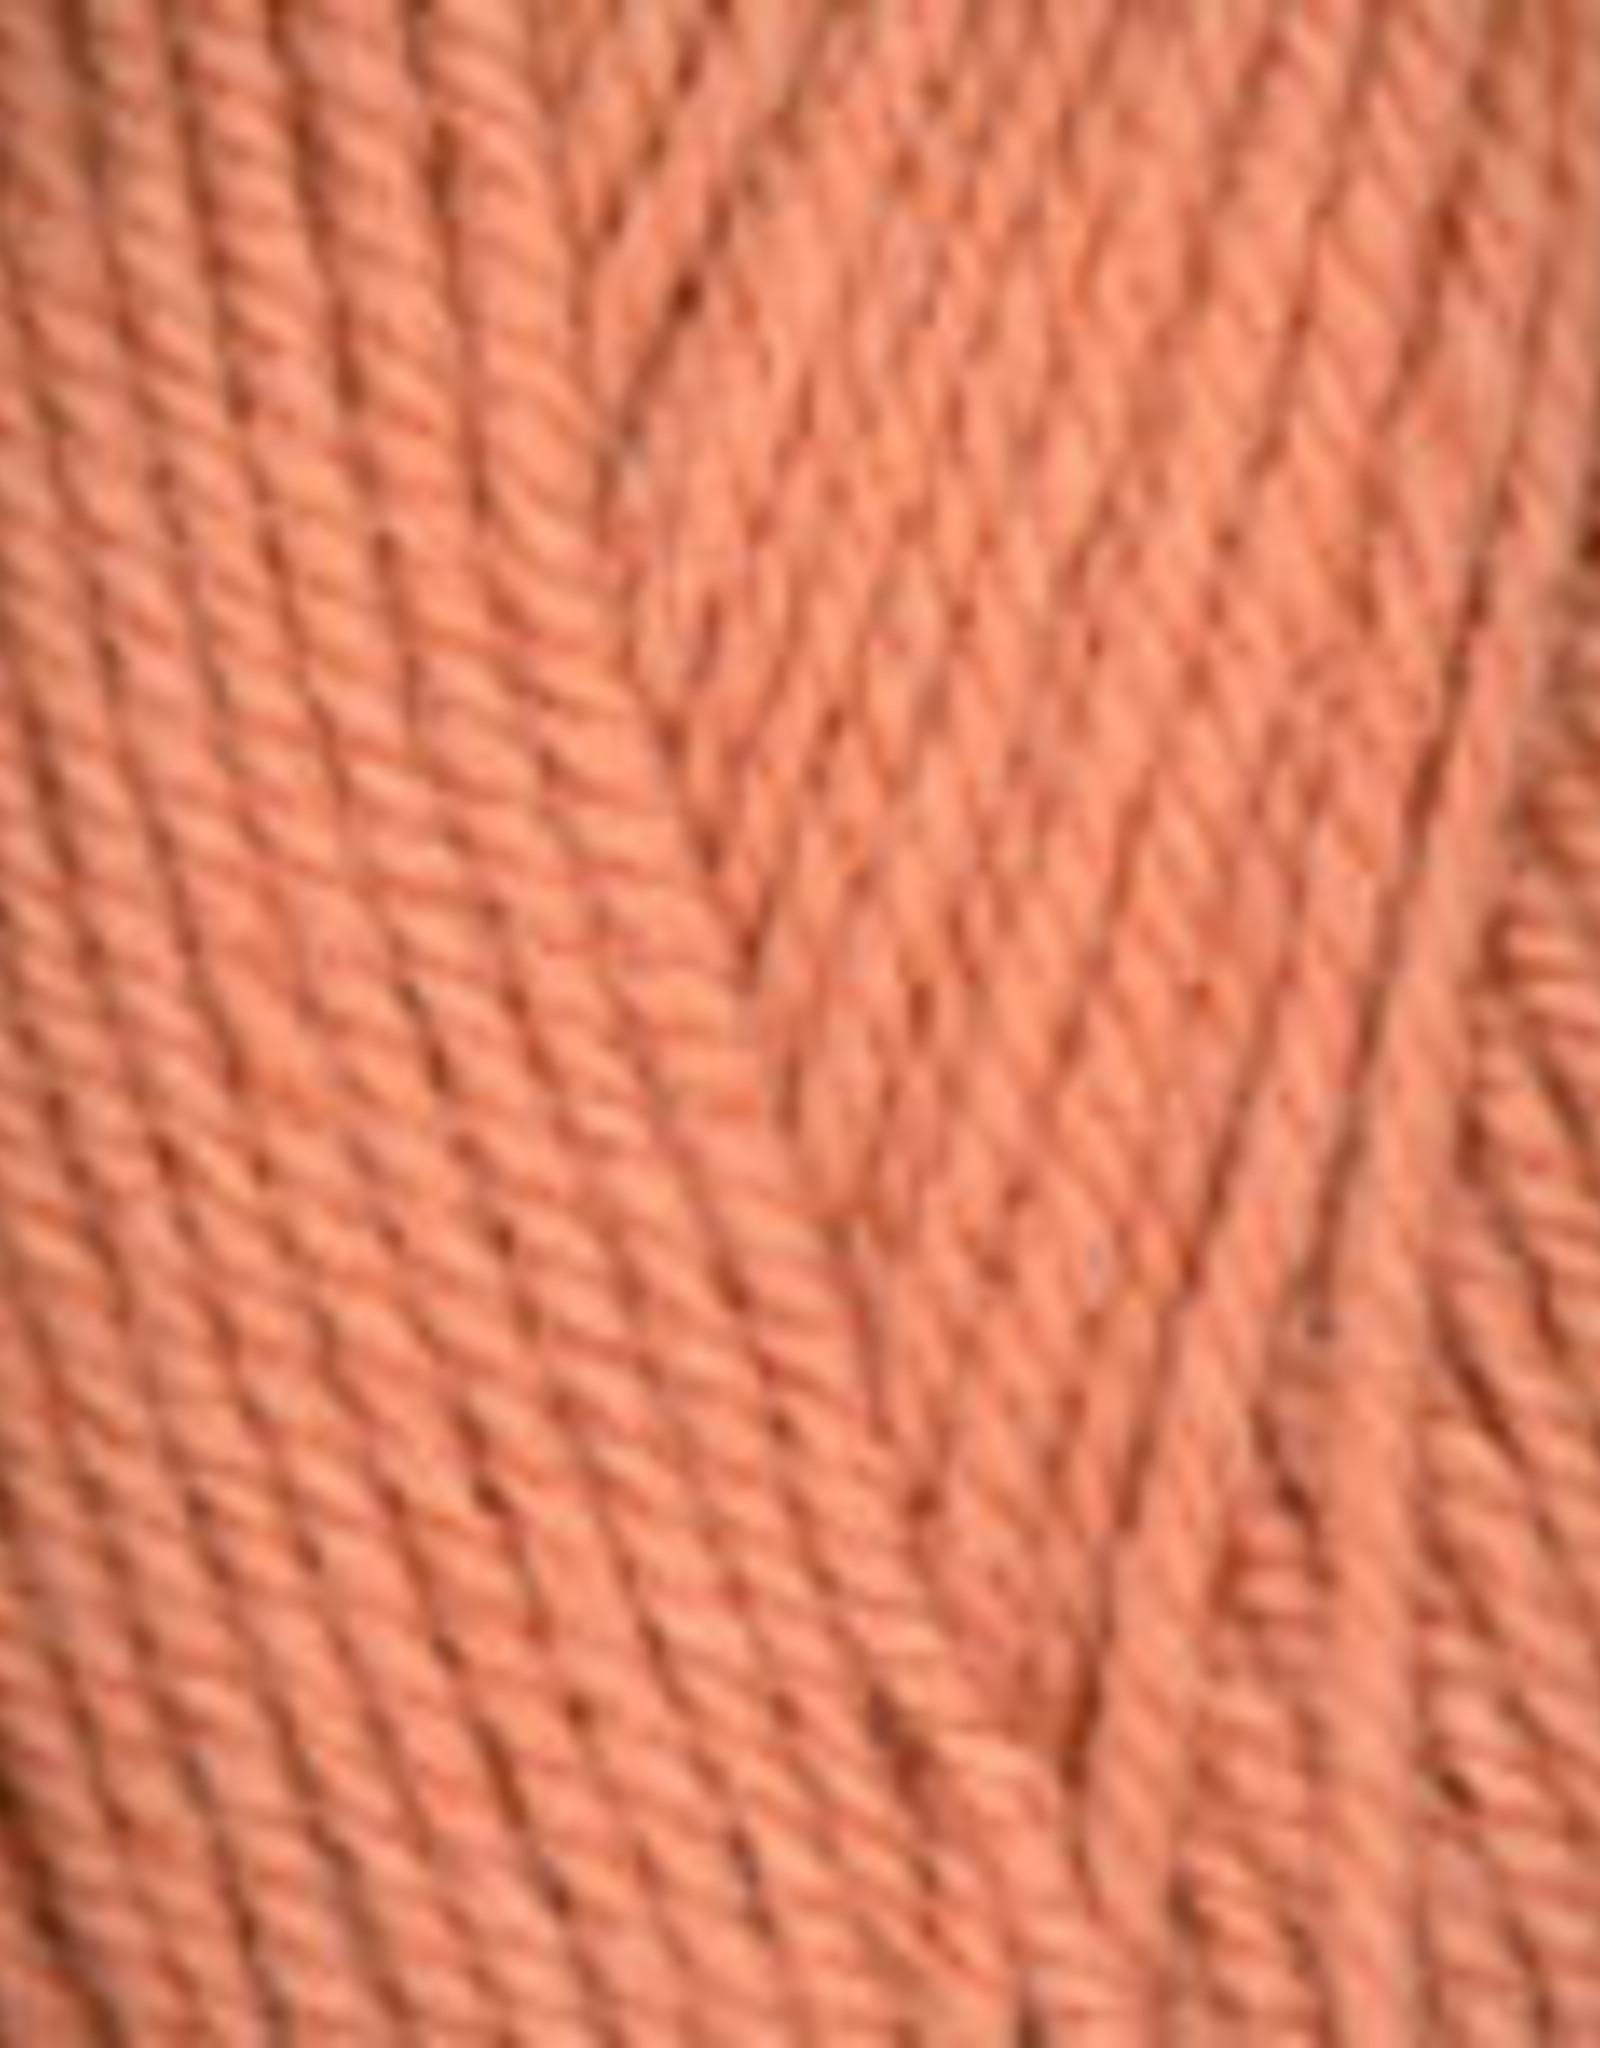 Plymouth Yarns Encore 100g 703 amber blush